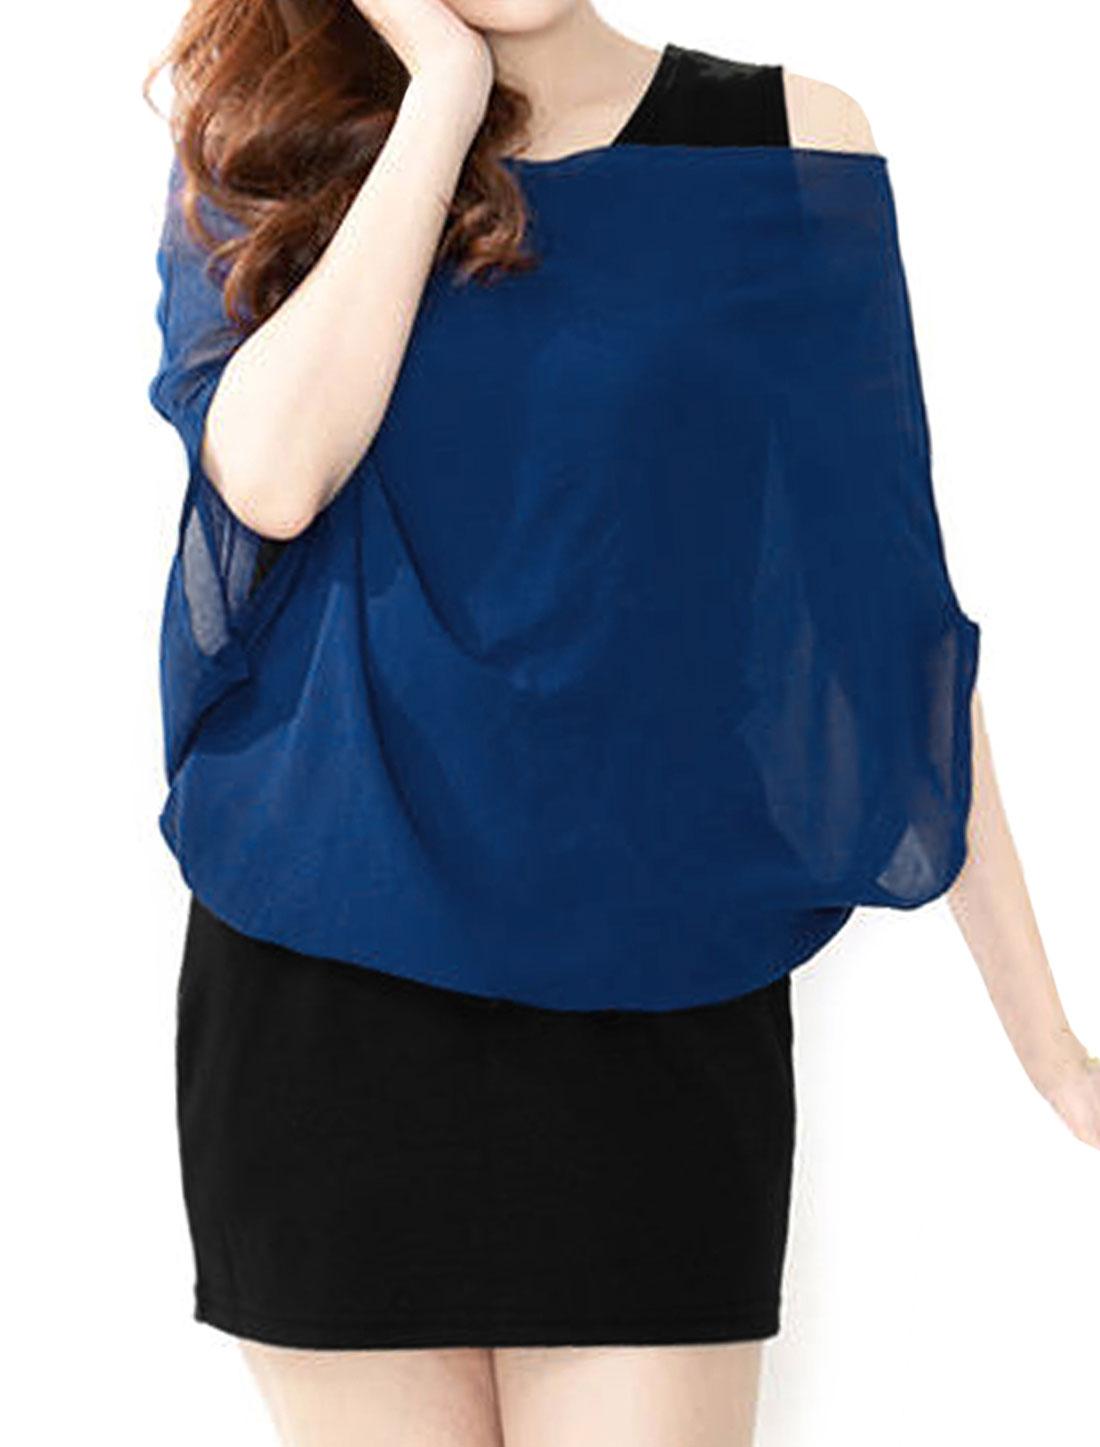 Lady Scoop Neck Chiffon Splice Design Navy Blue Black Mini Dress XS